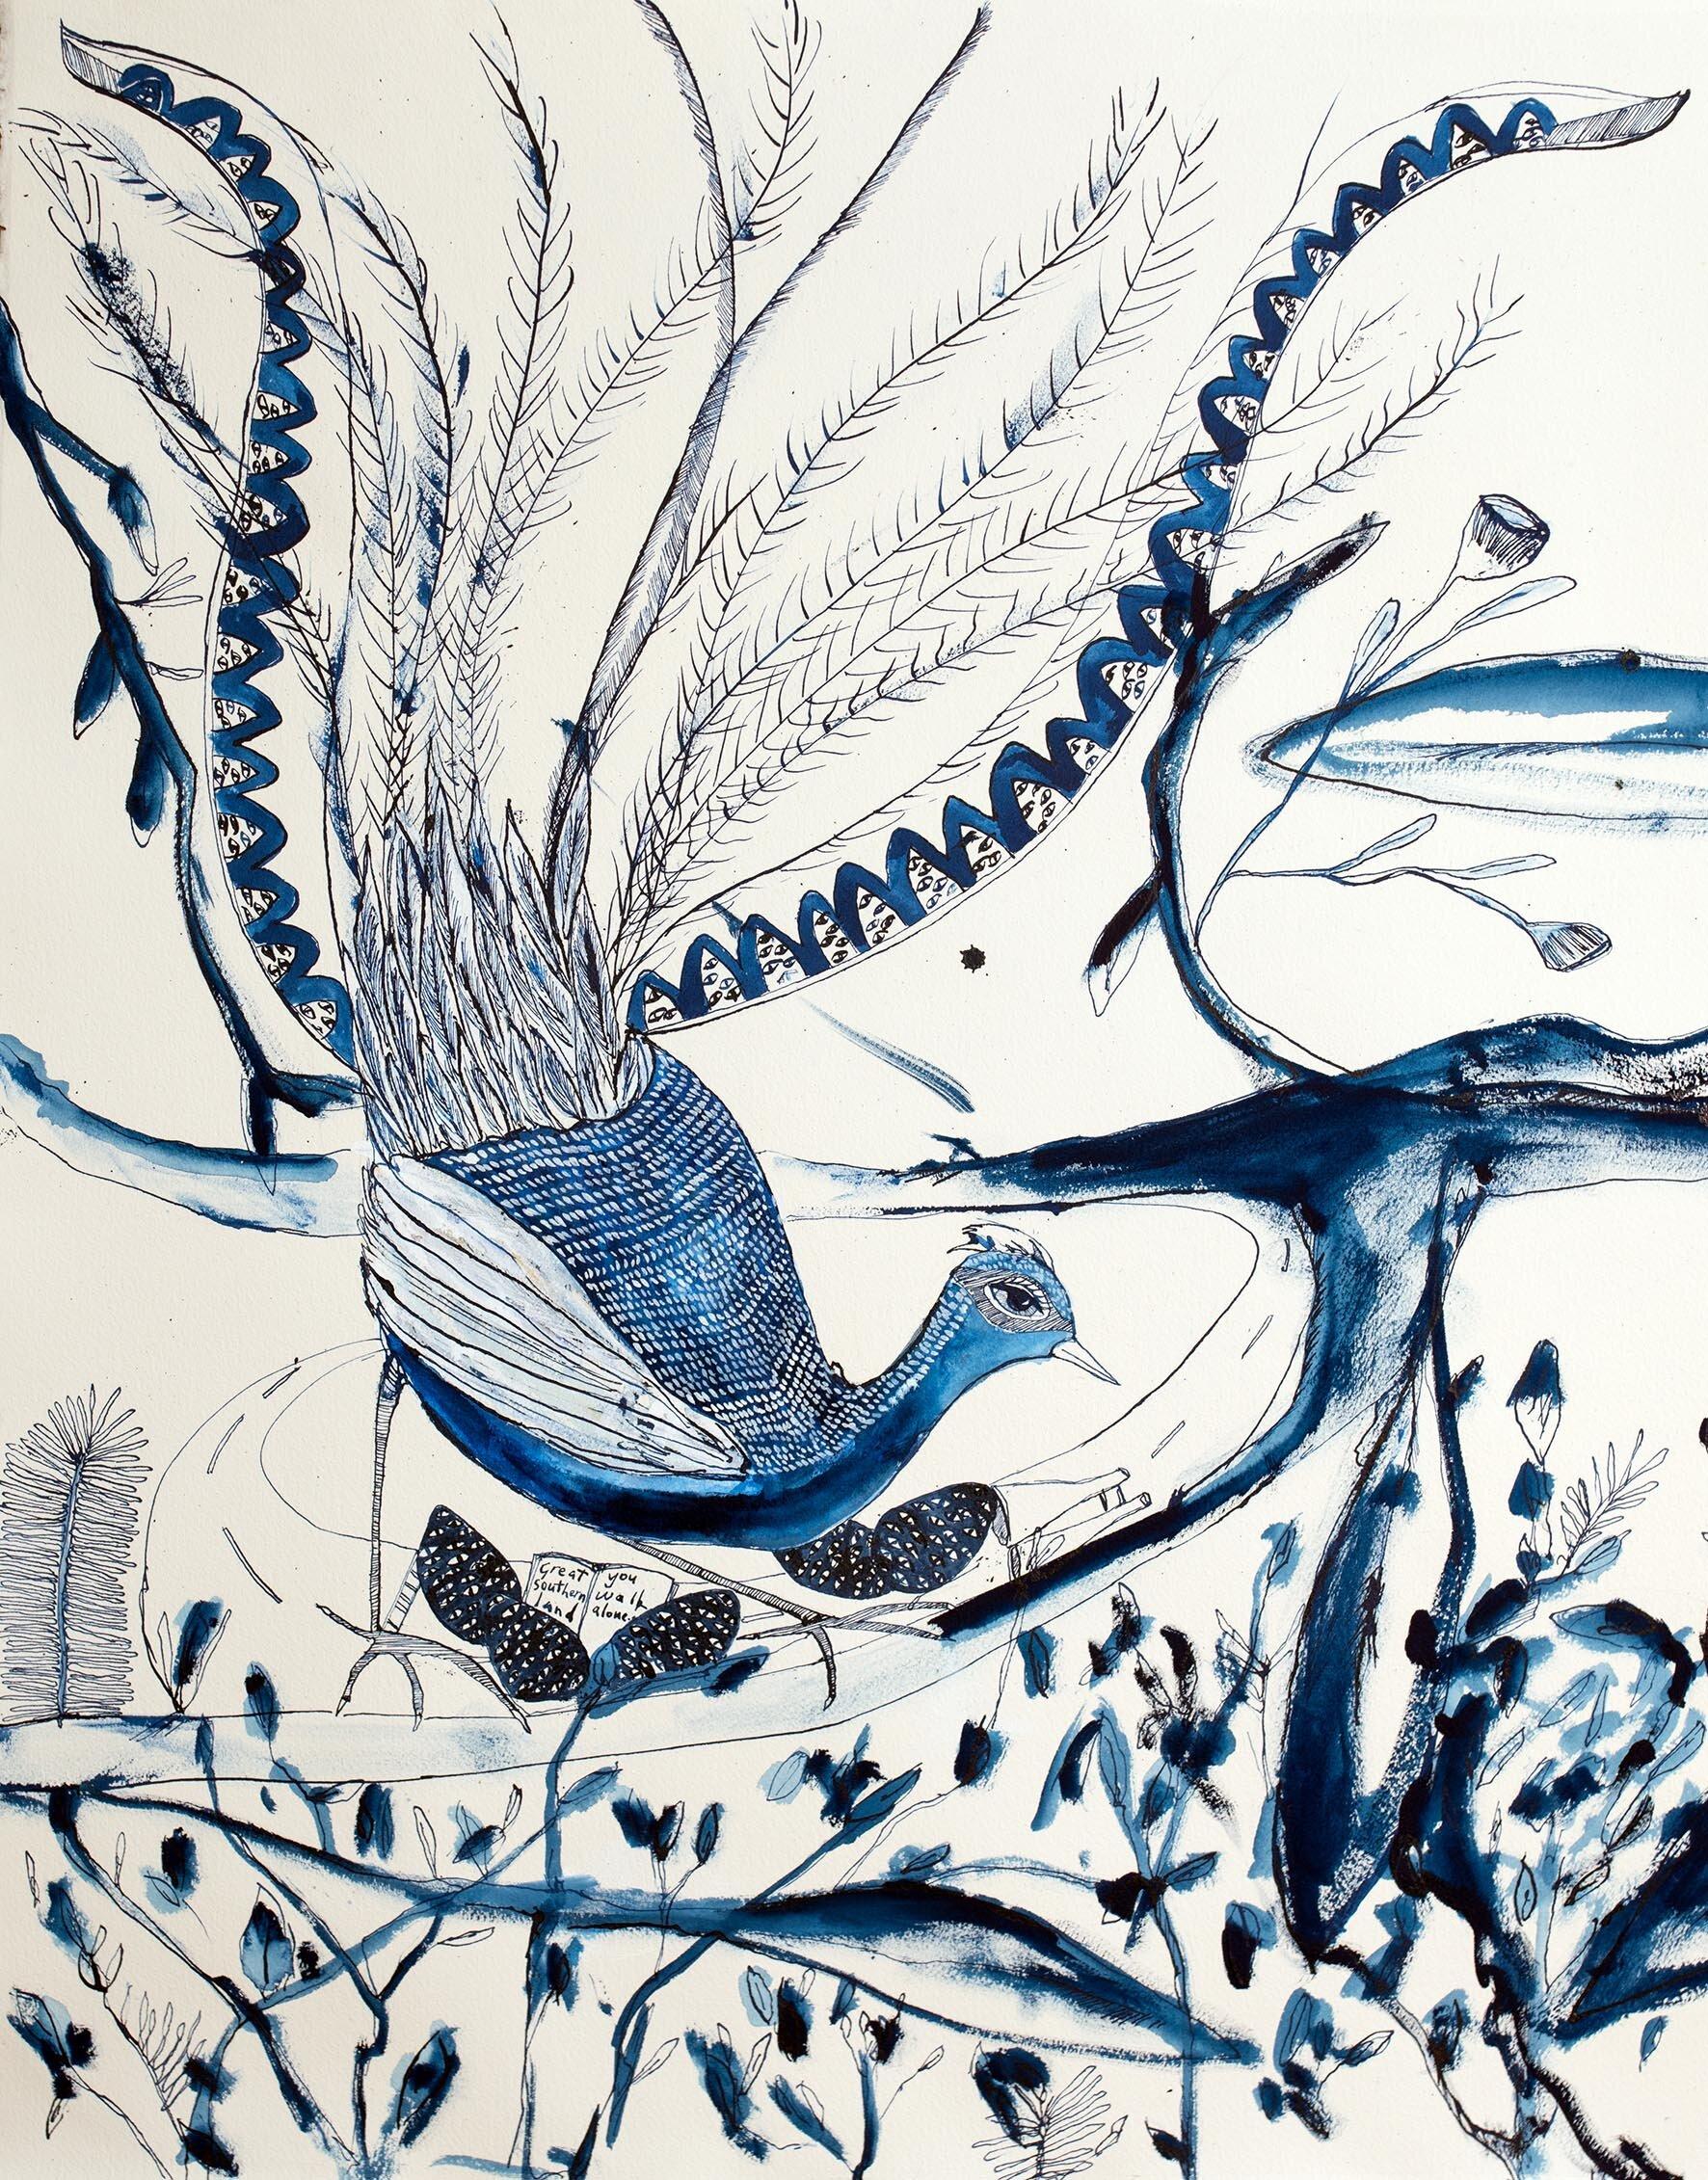 Bertie Blackman, Liar Liar Bird 56cm x 65cm. gouache, watercolour, shellac ink on 300 gsm French cotton rag paper, framed, available